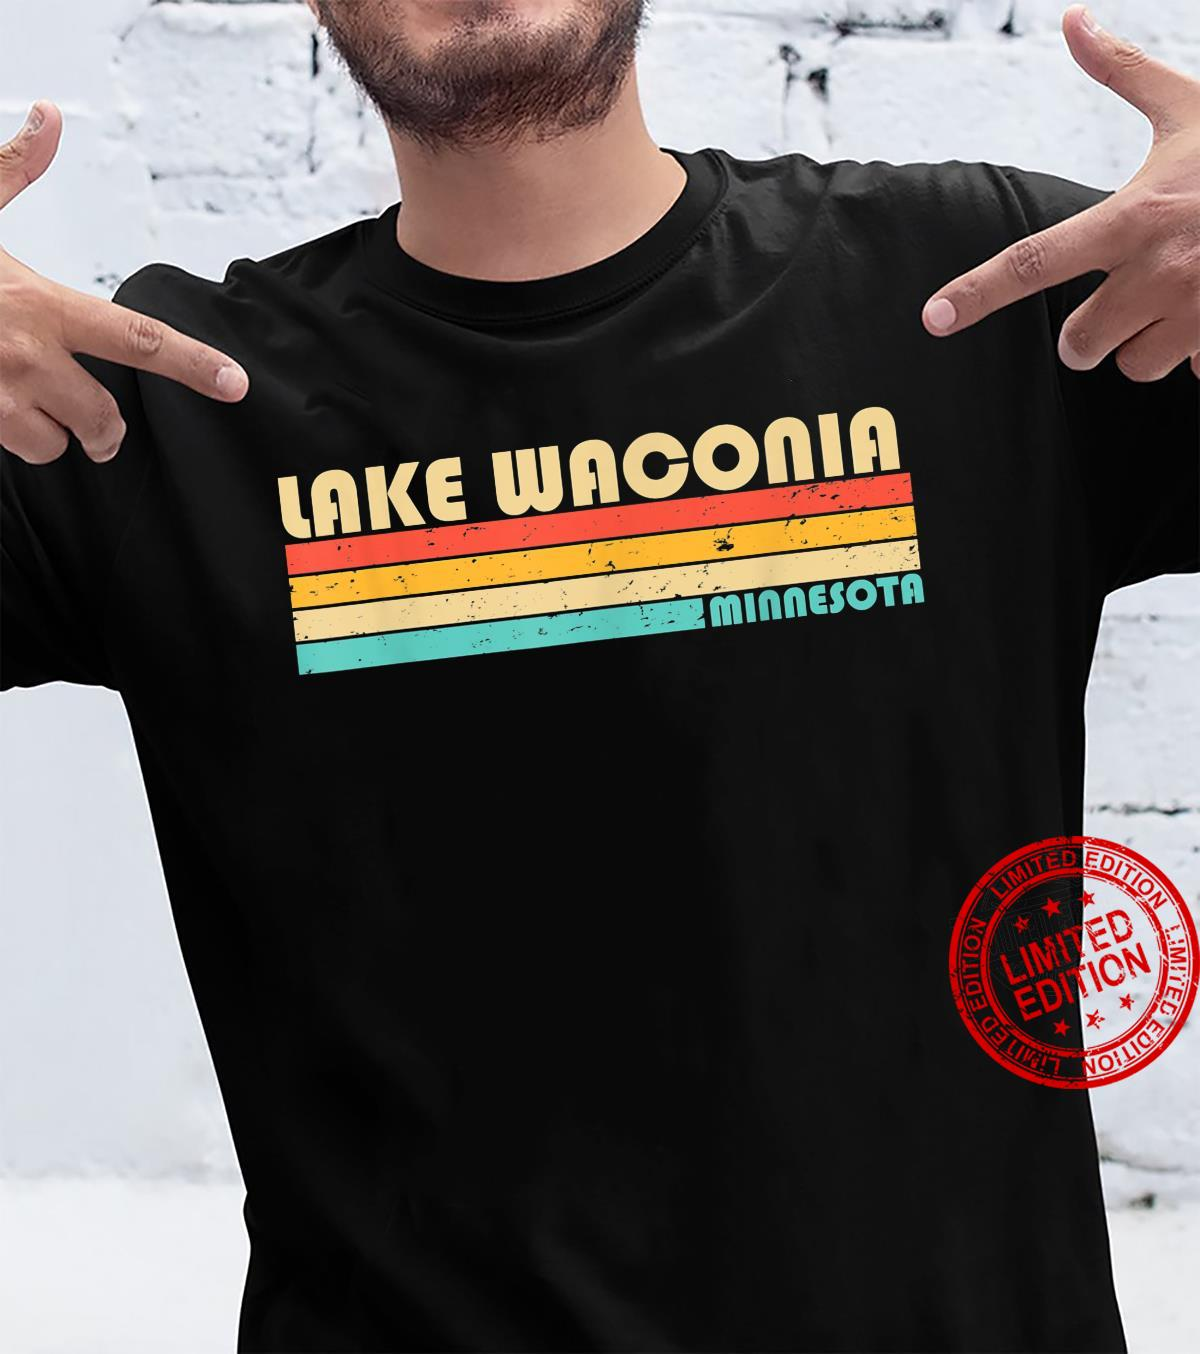 LAKE WACONIA MINNESOTA Fishing Camping Summer Shirt